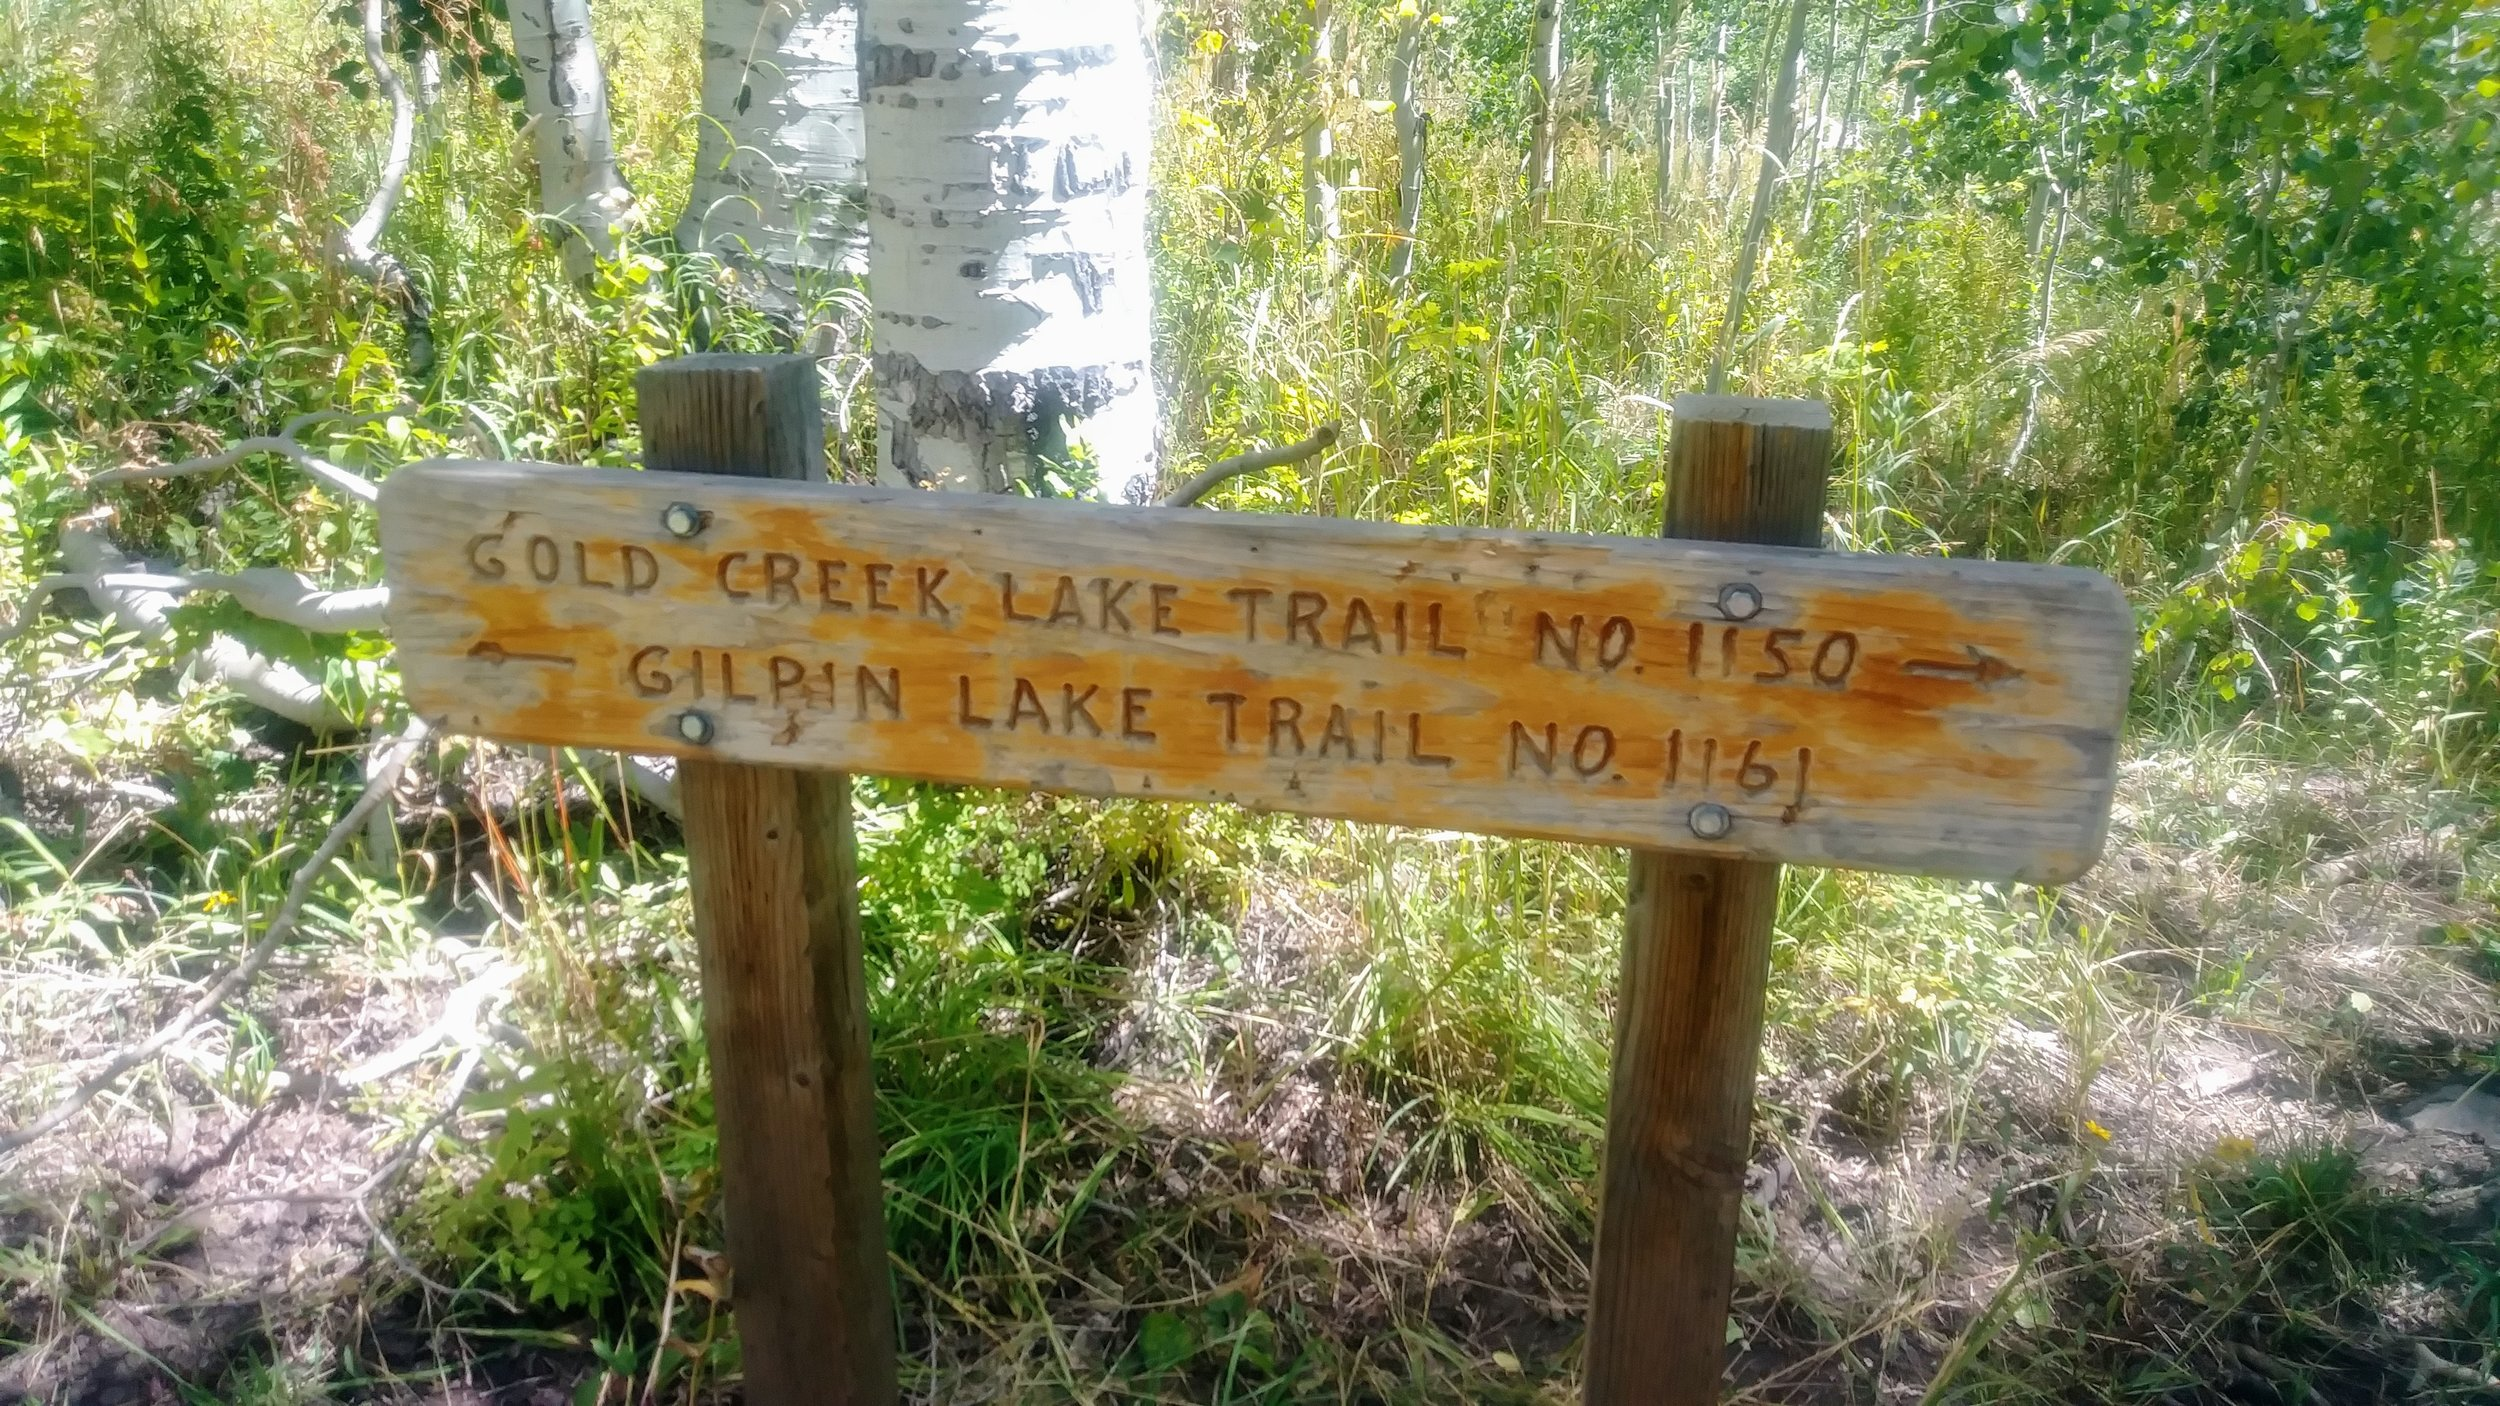 Trail sign at split of Gold Creek Lake Trail and Gilpin Lake Trail